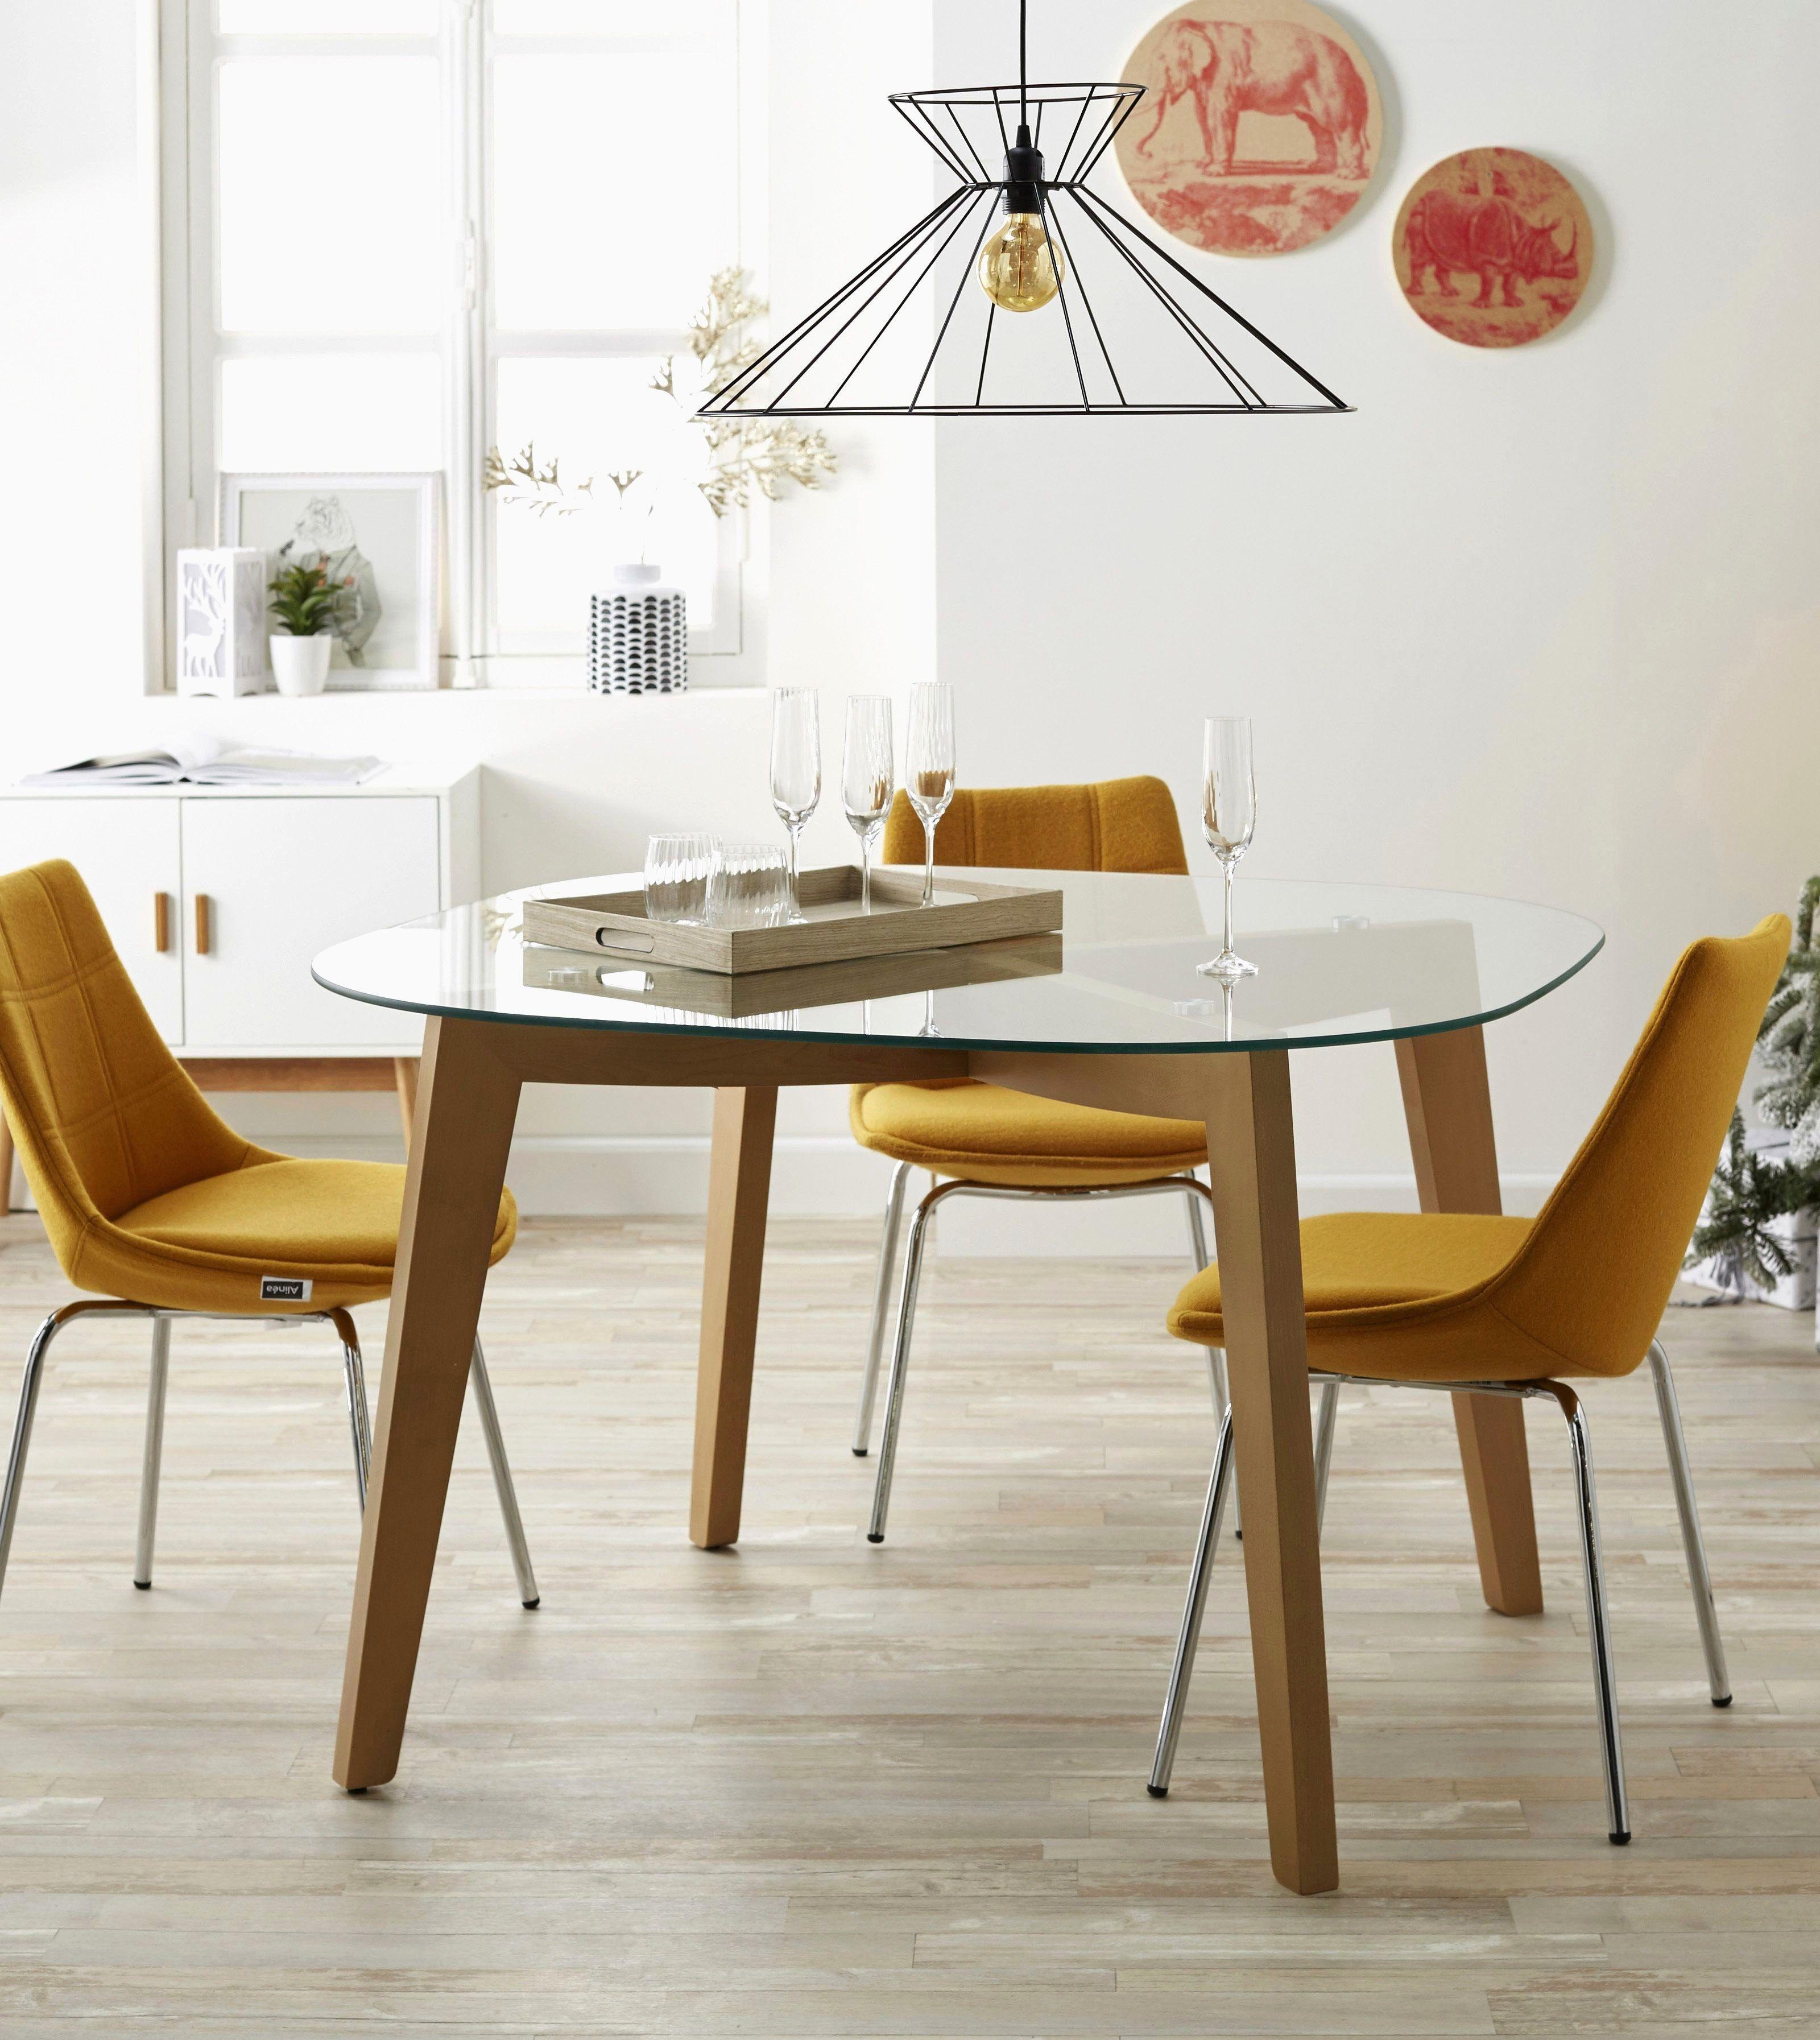 Best Of Garde Meuble Perpignan Table Salle A Manger Meuble Salle A Manger Table Et Chaises